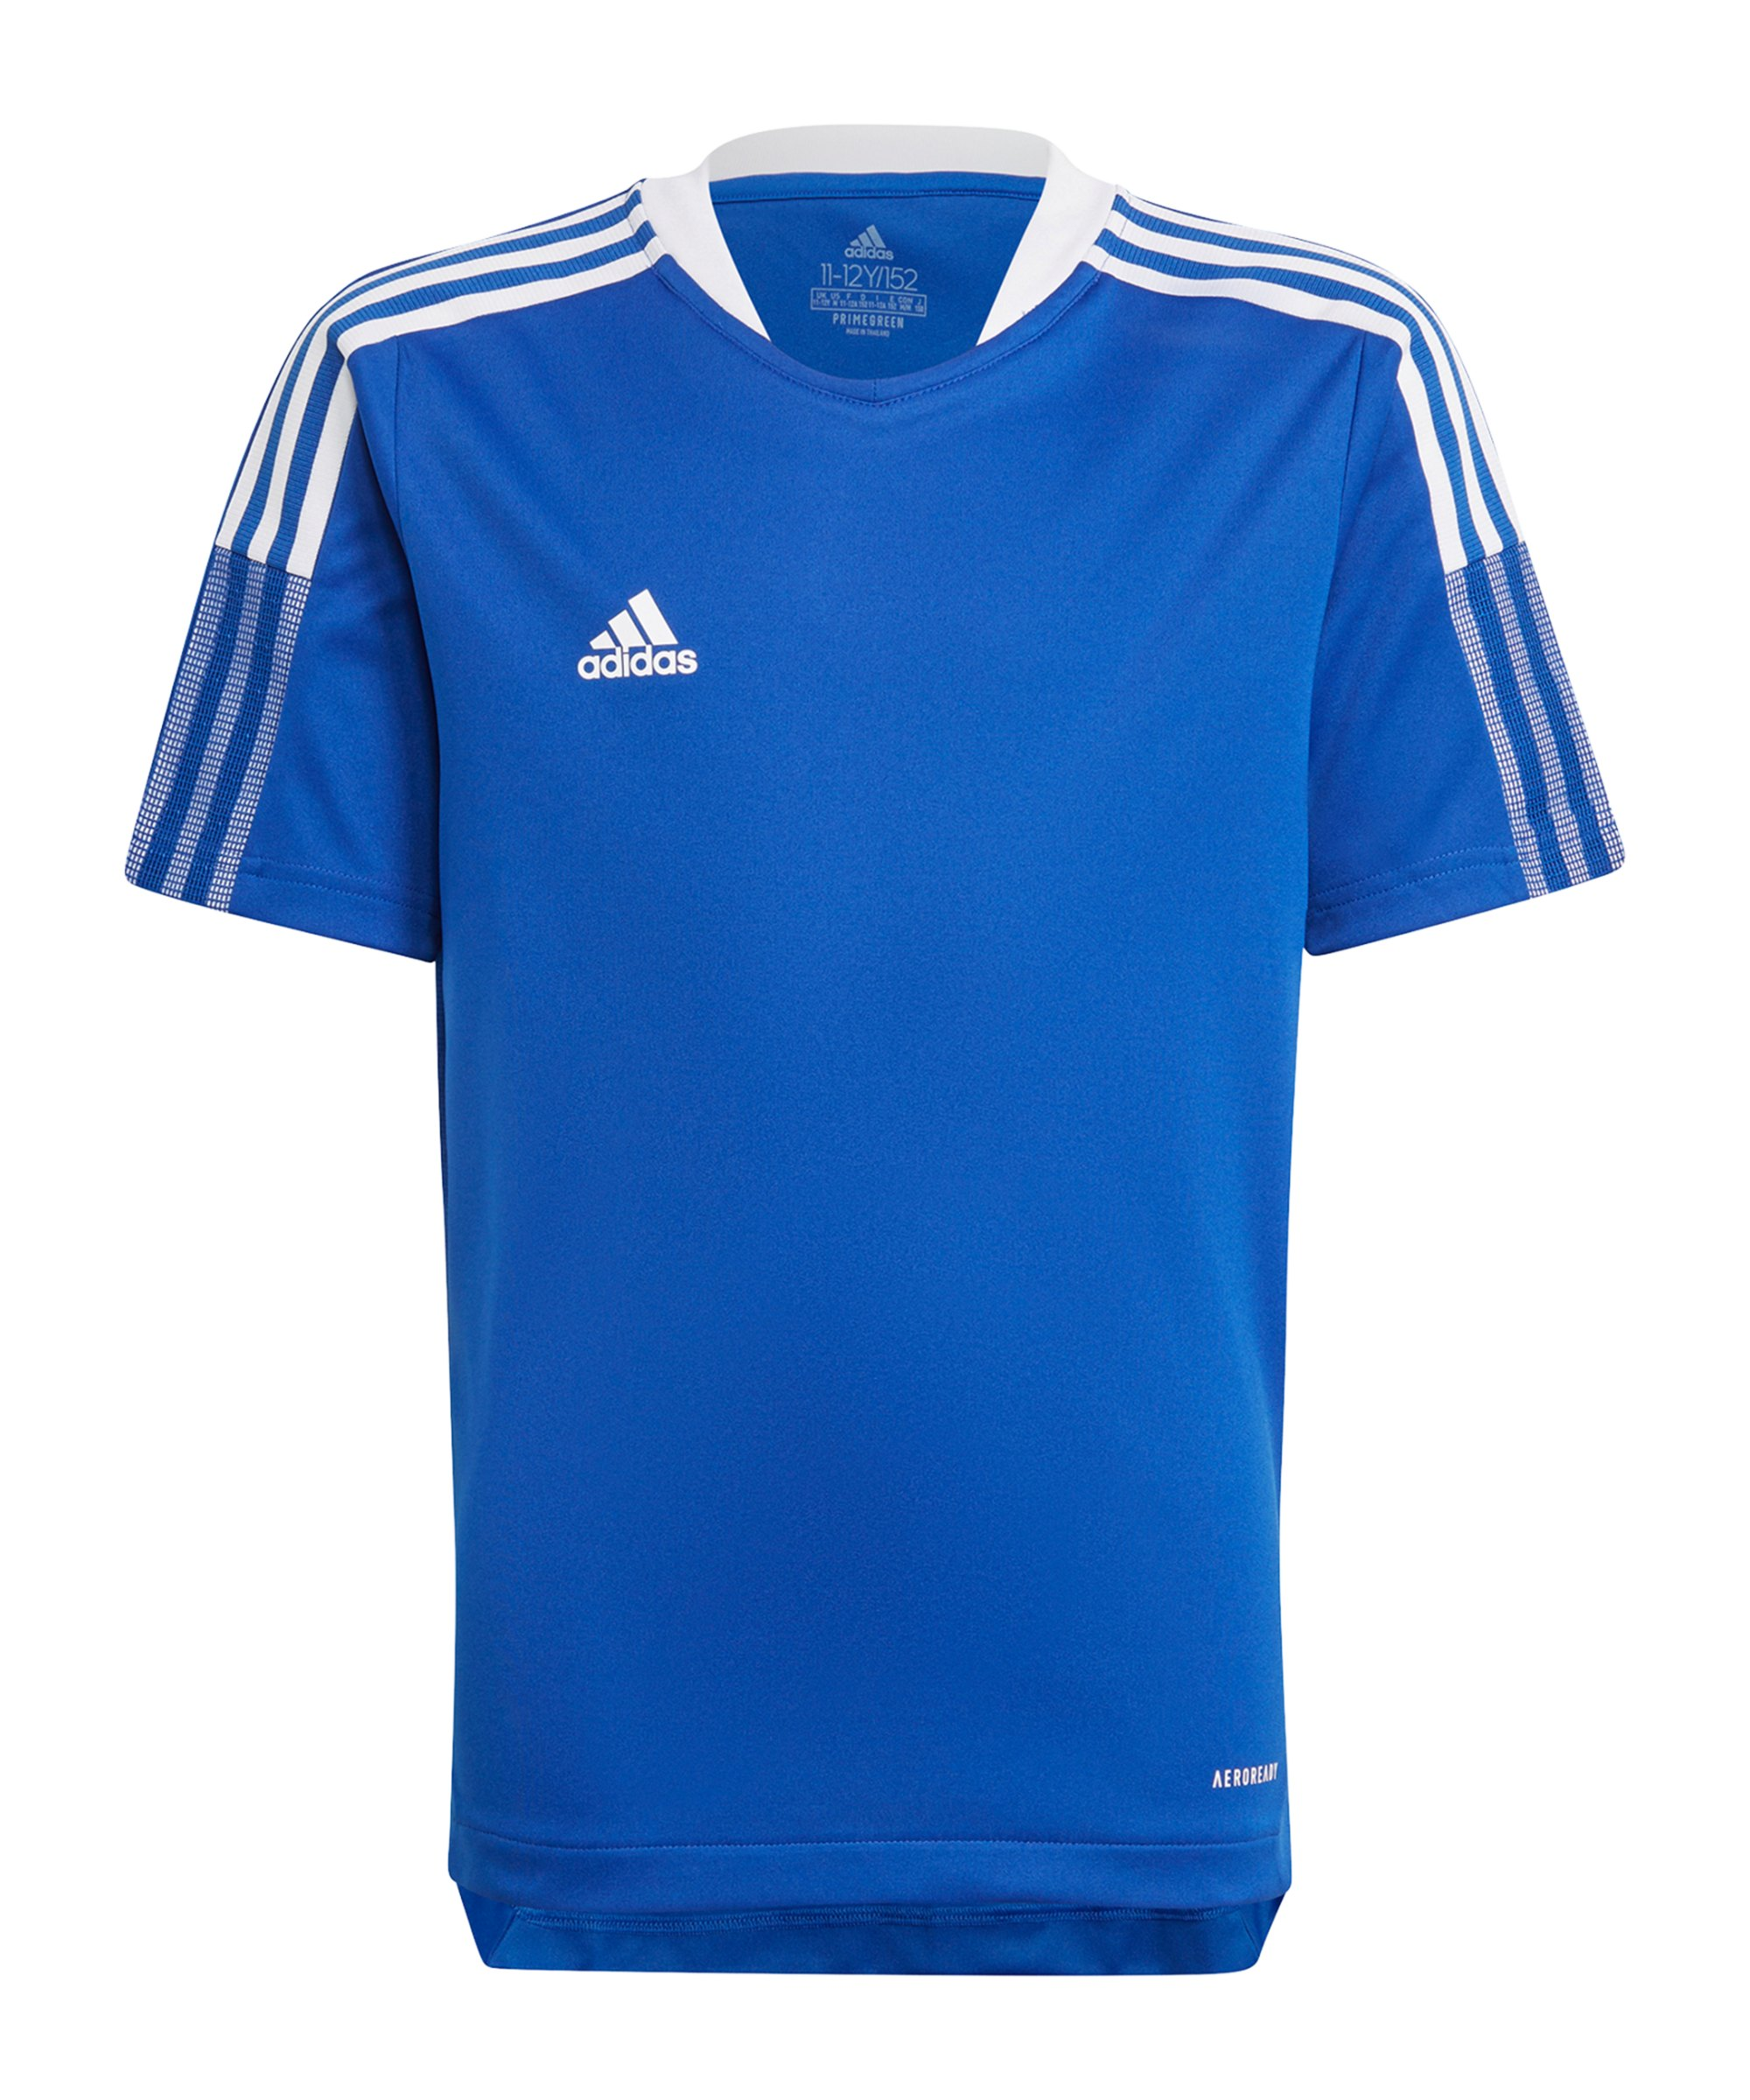 adidas Tiro 21 Trainingsshirt Kids Blau - blau